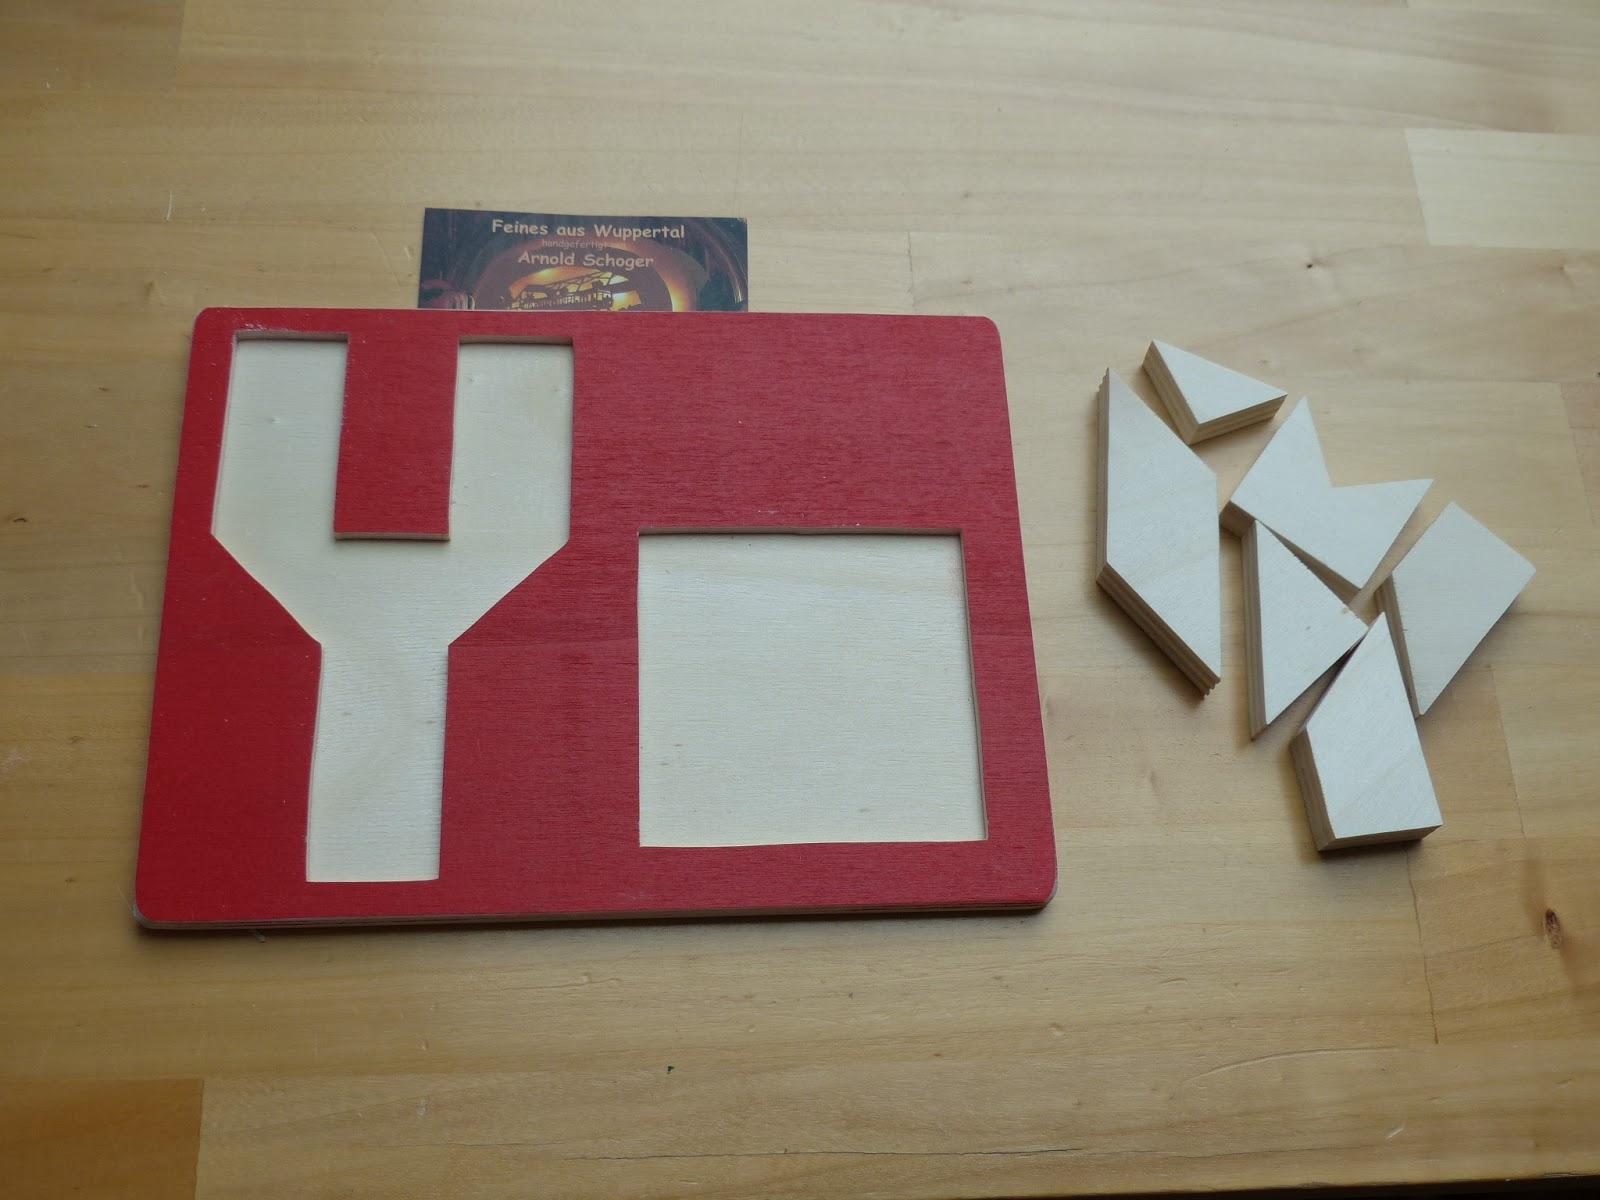 holzbuchstaben puzzle f y knobelspiel laubs gearbeiten. Black Bedroom Furniture Sets. Home Design Ideas